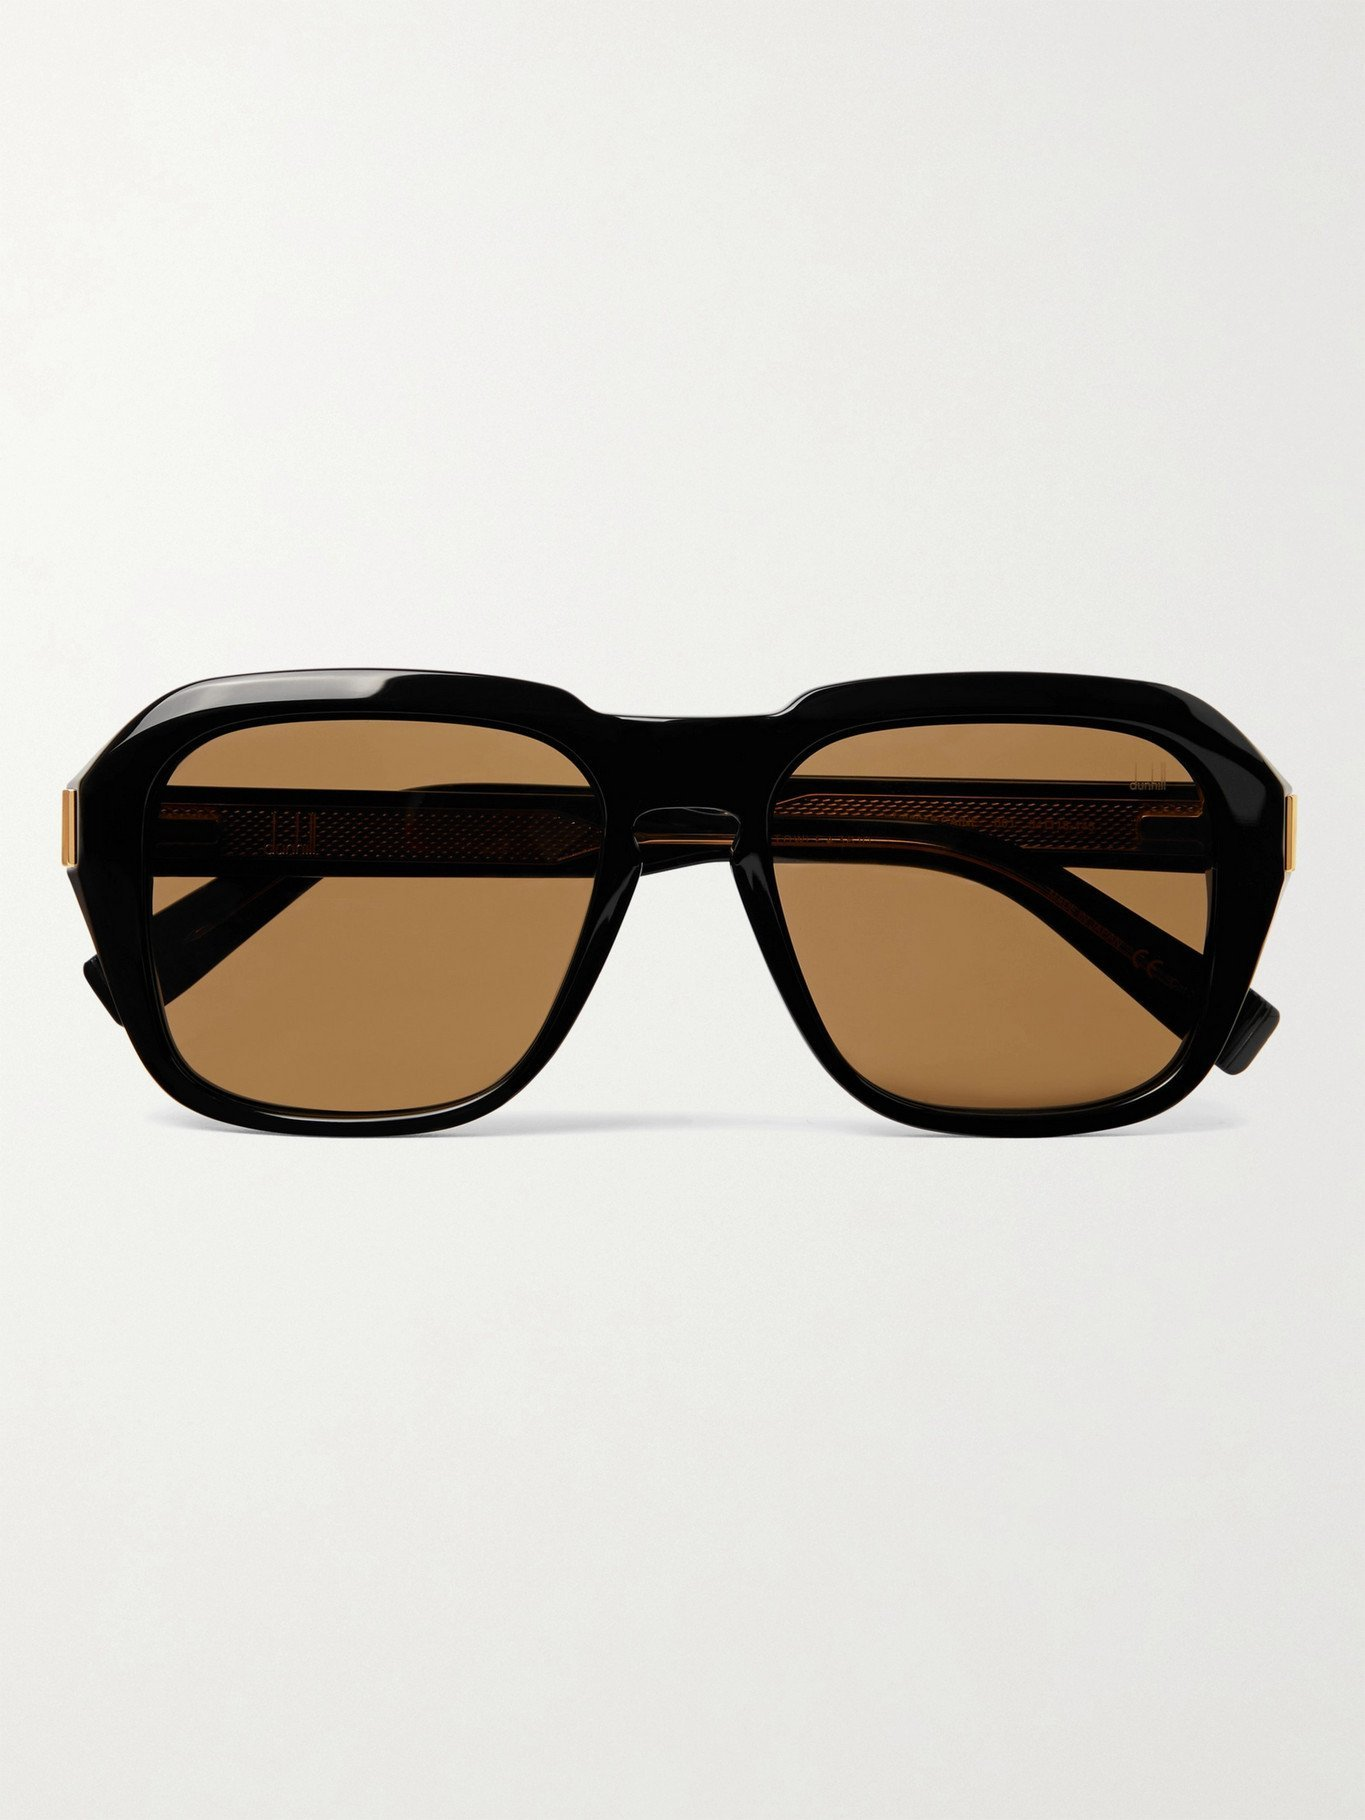 DUNHILL - Round-Frame Acetate Sunglasses - Black